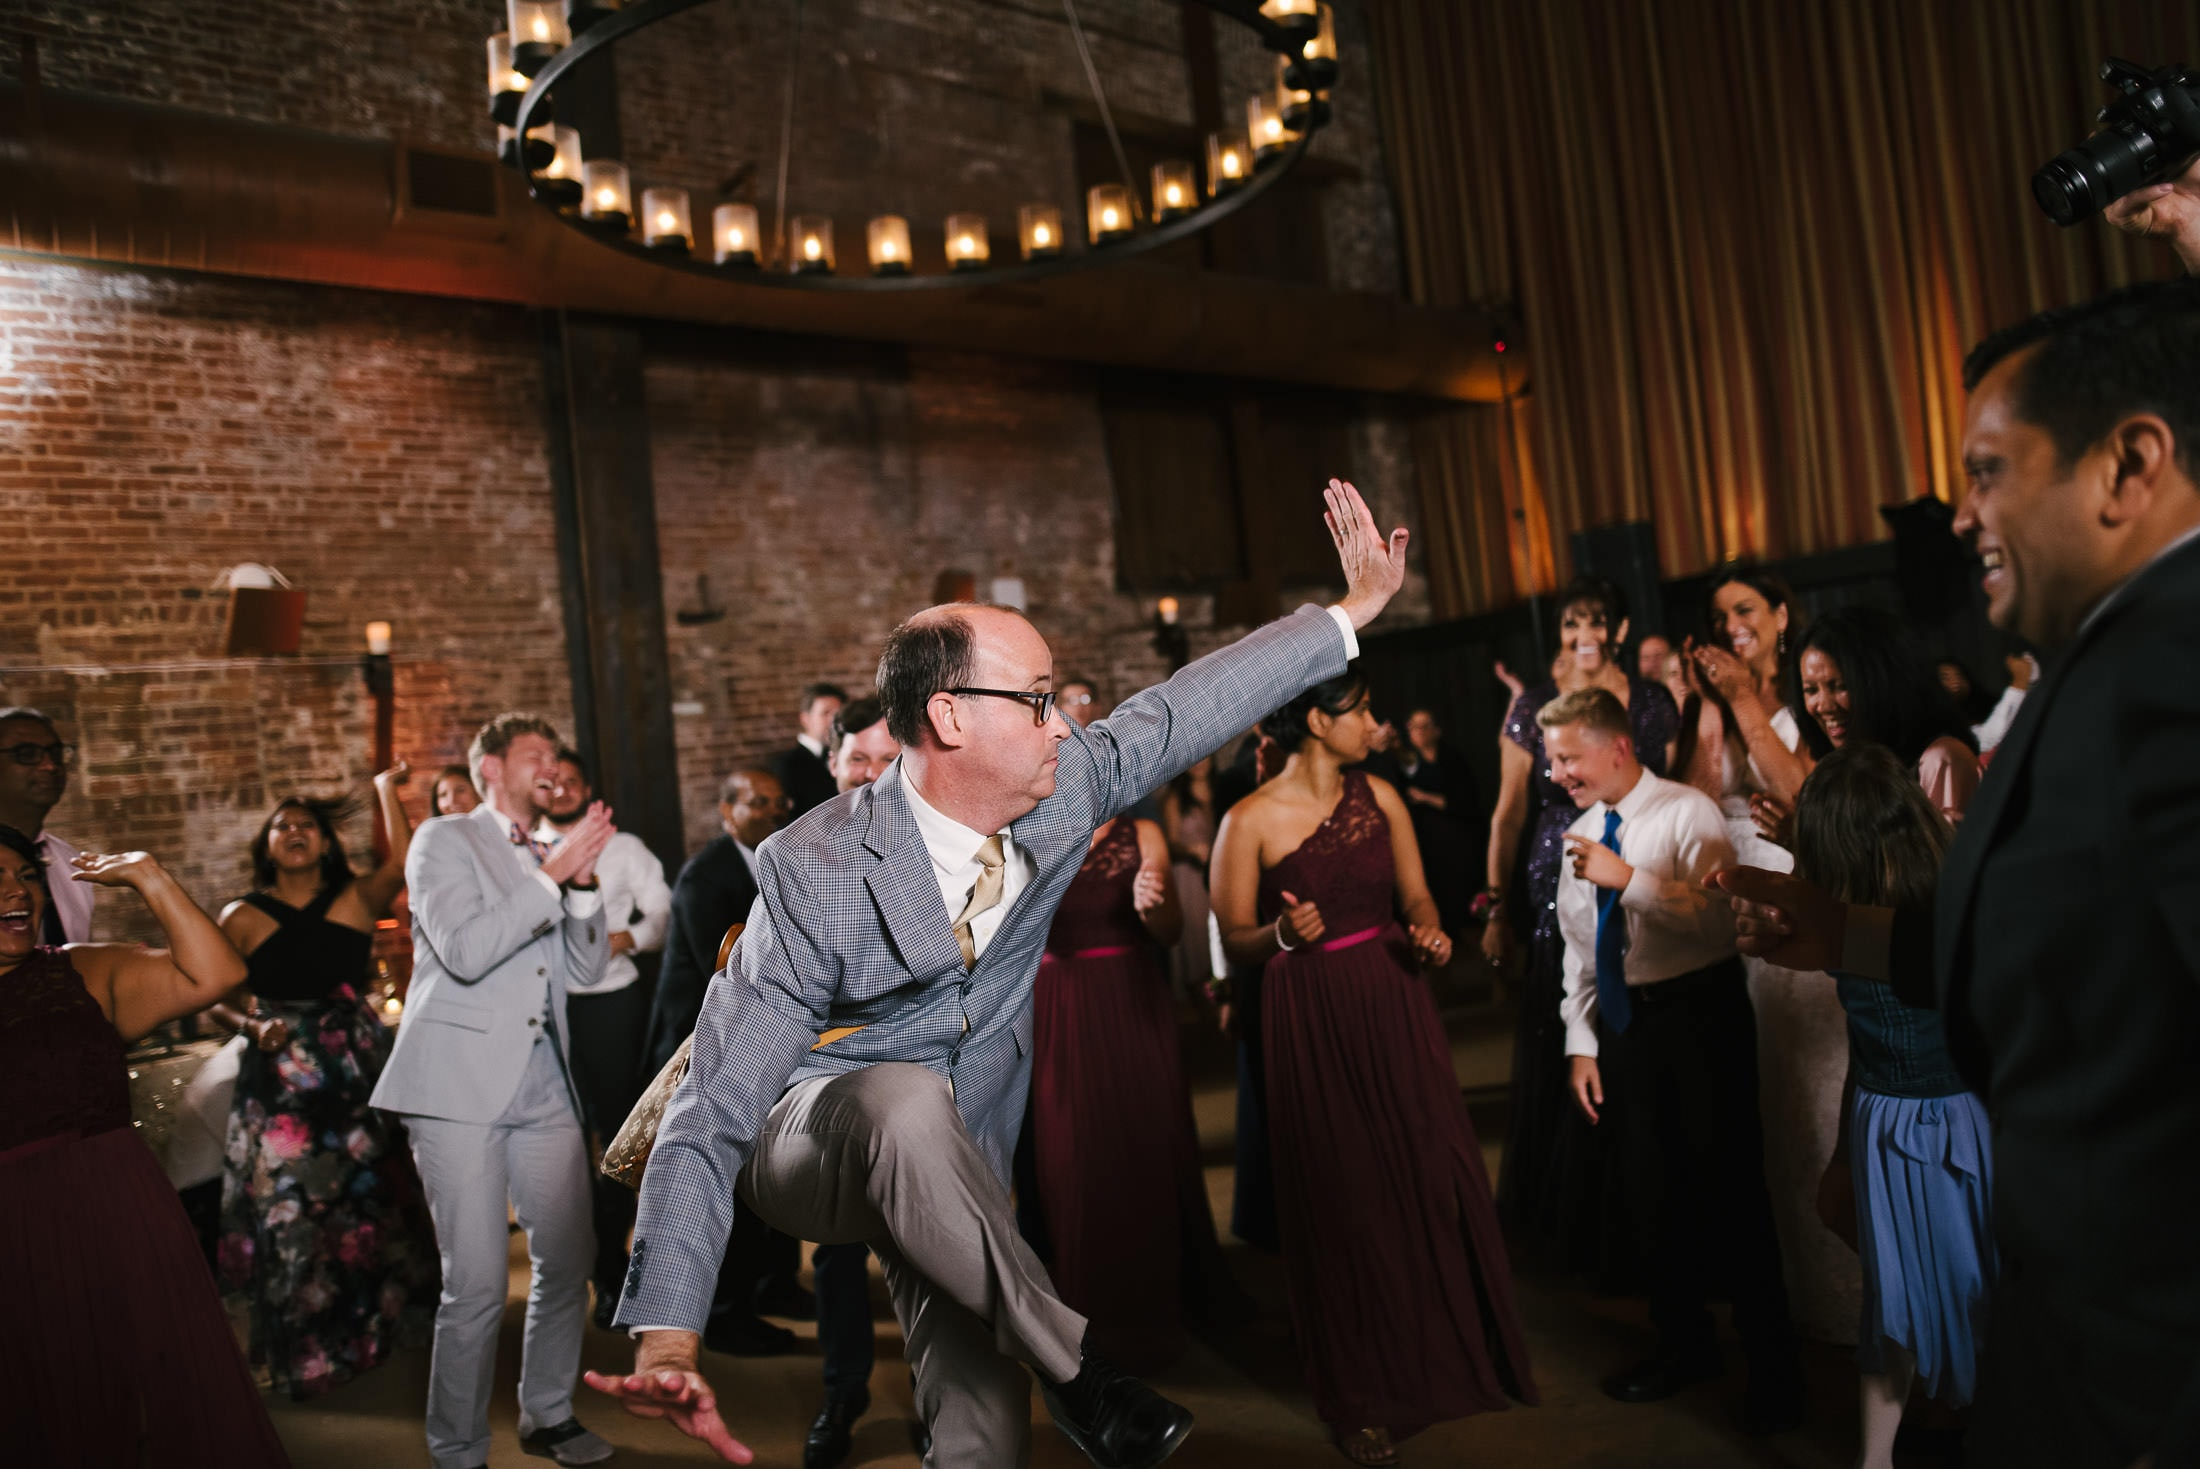 Fun Wedding Dance Floor Pic